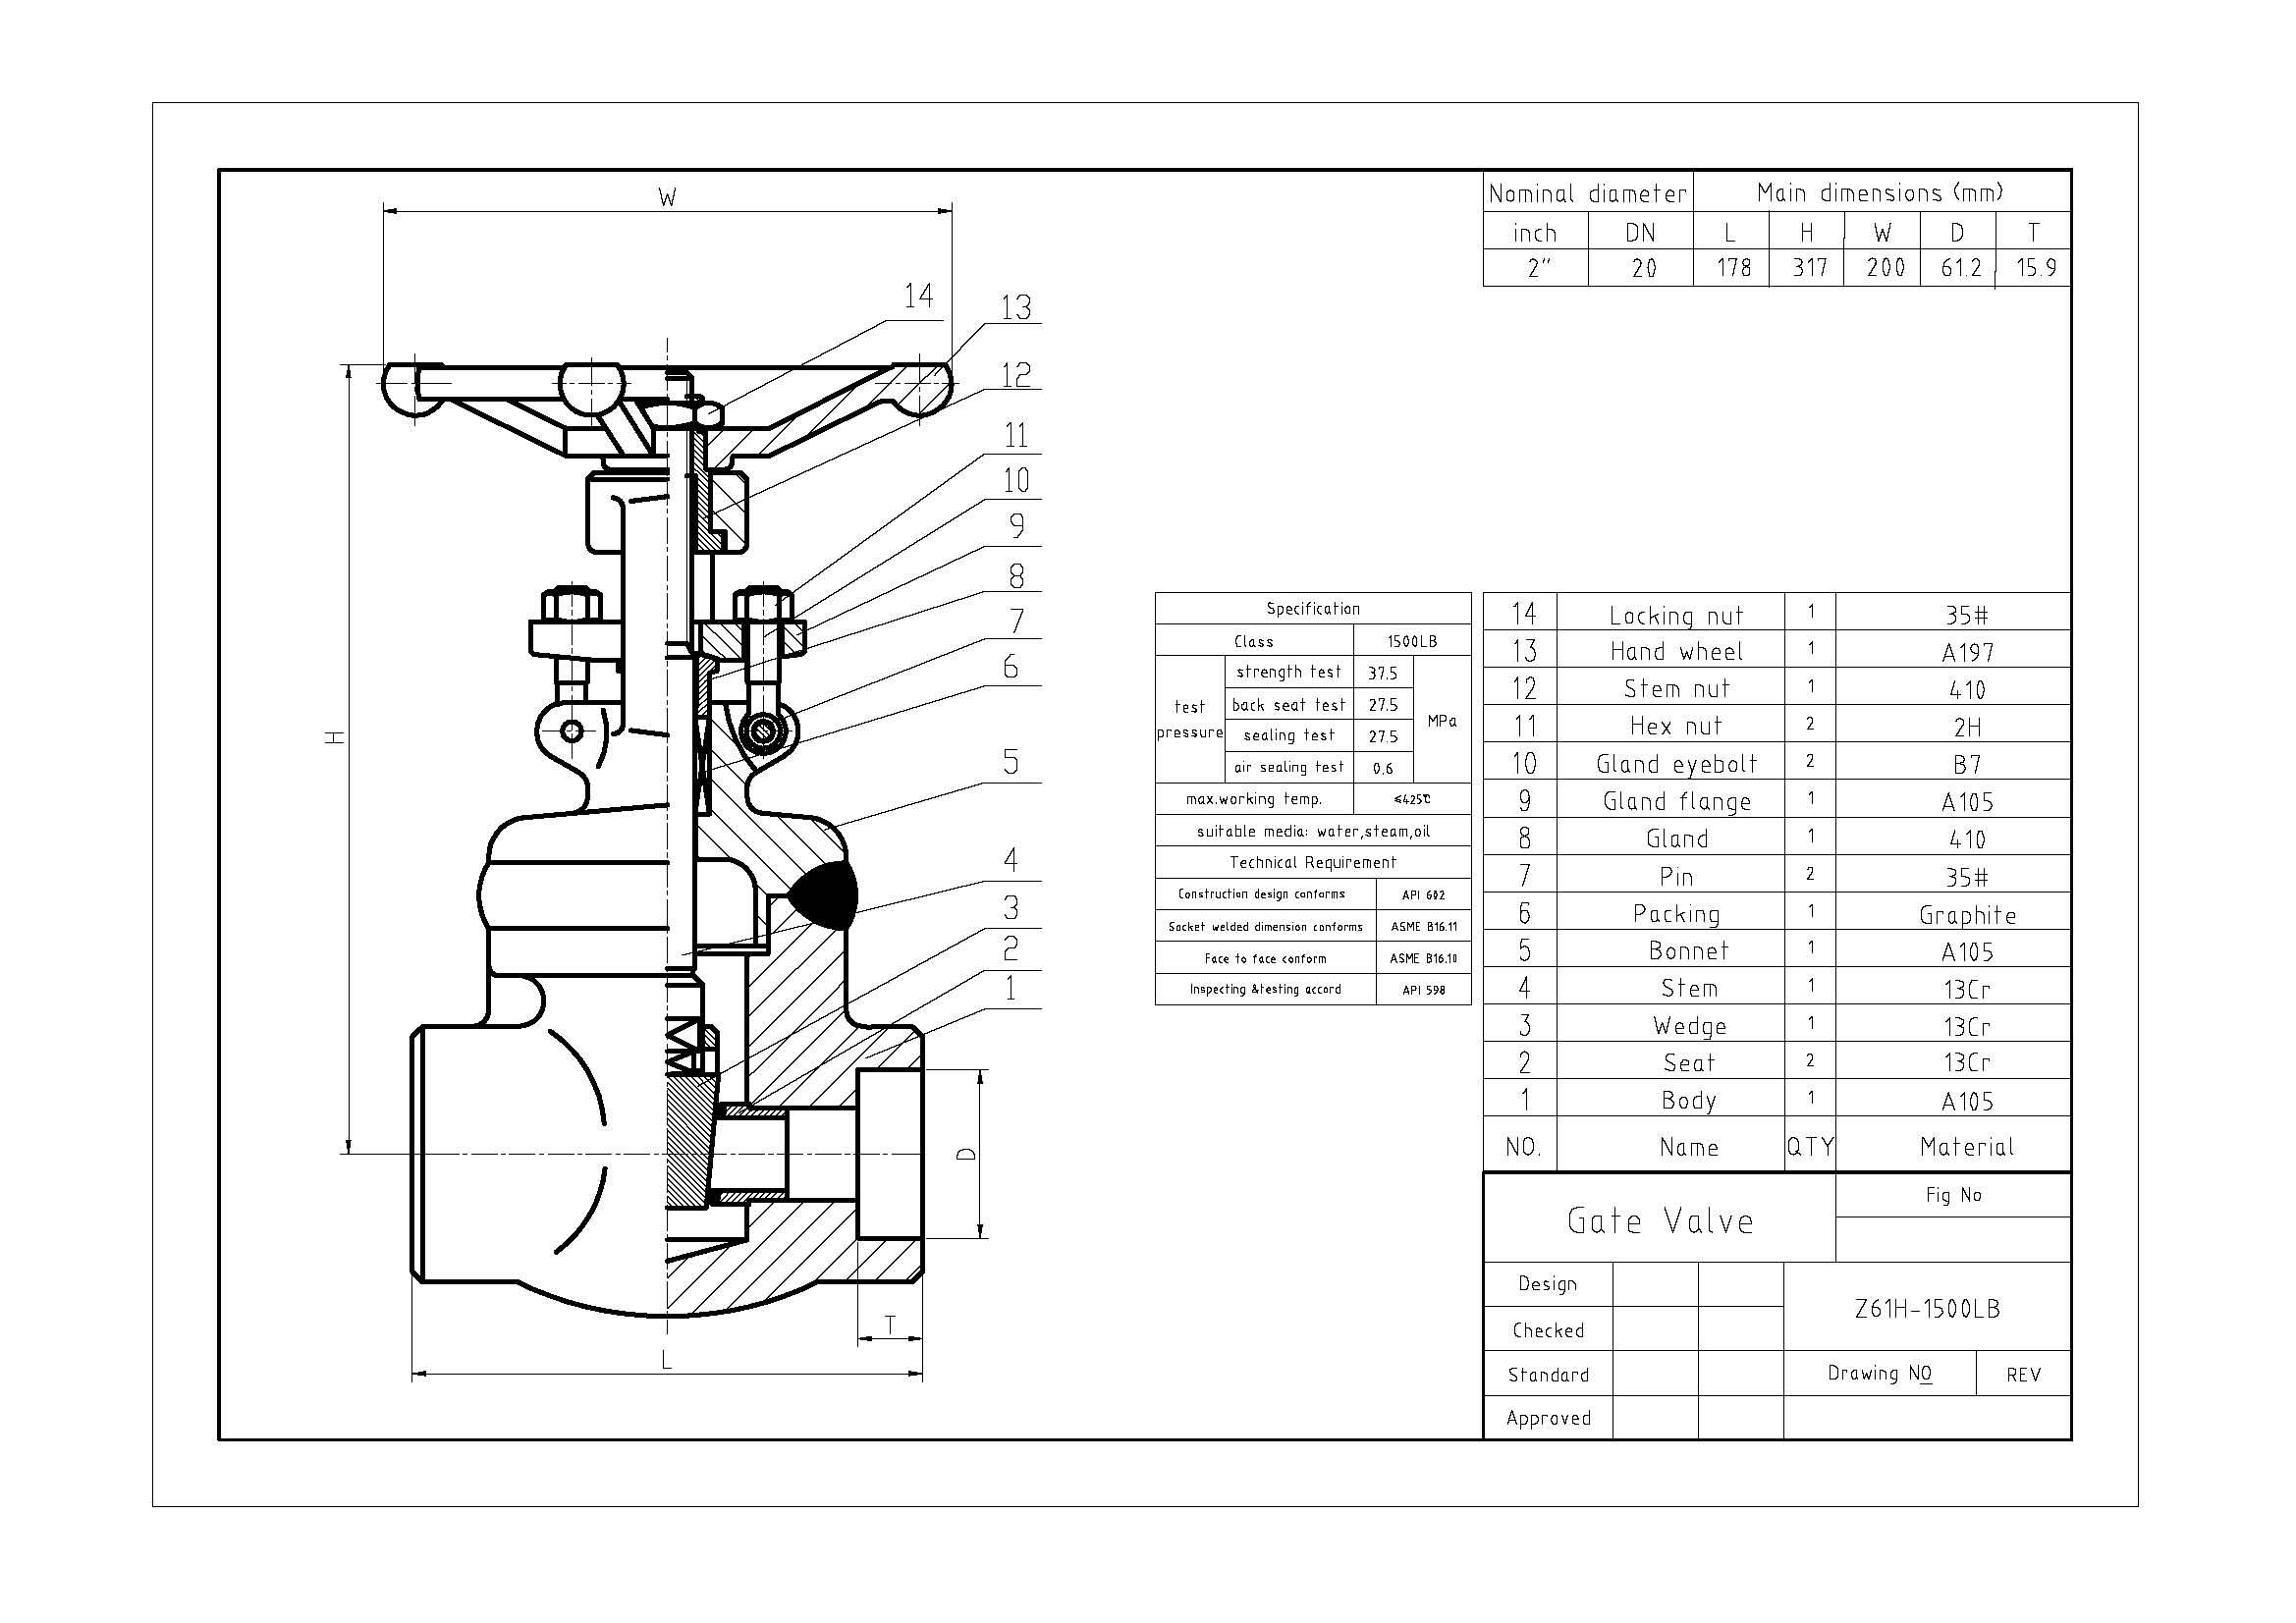 Lb Forged Steel Weld Bonnet Gate Valve A105n Body Dn50